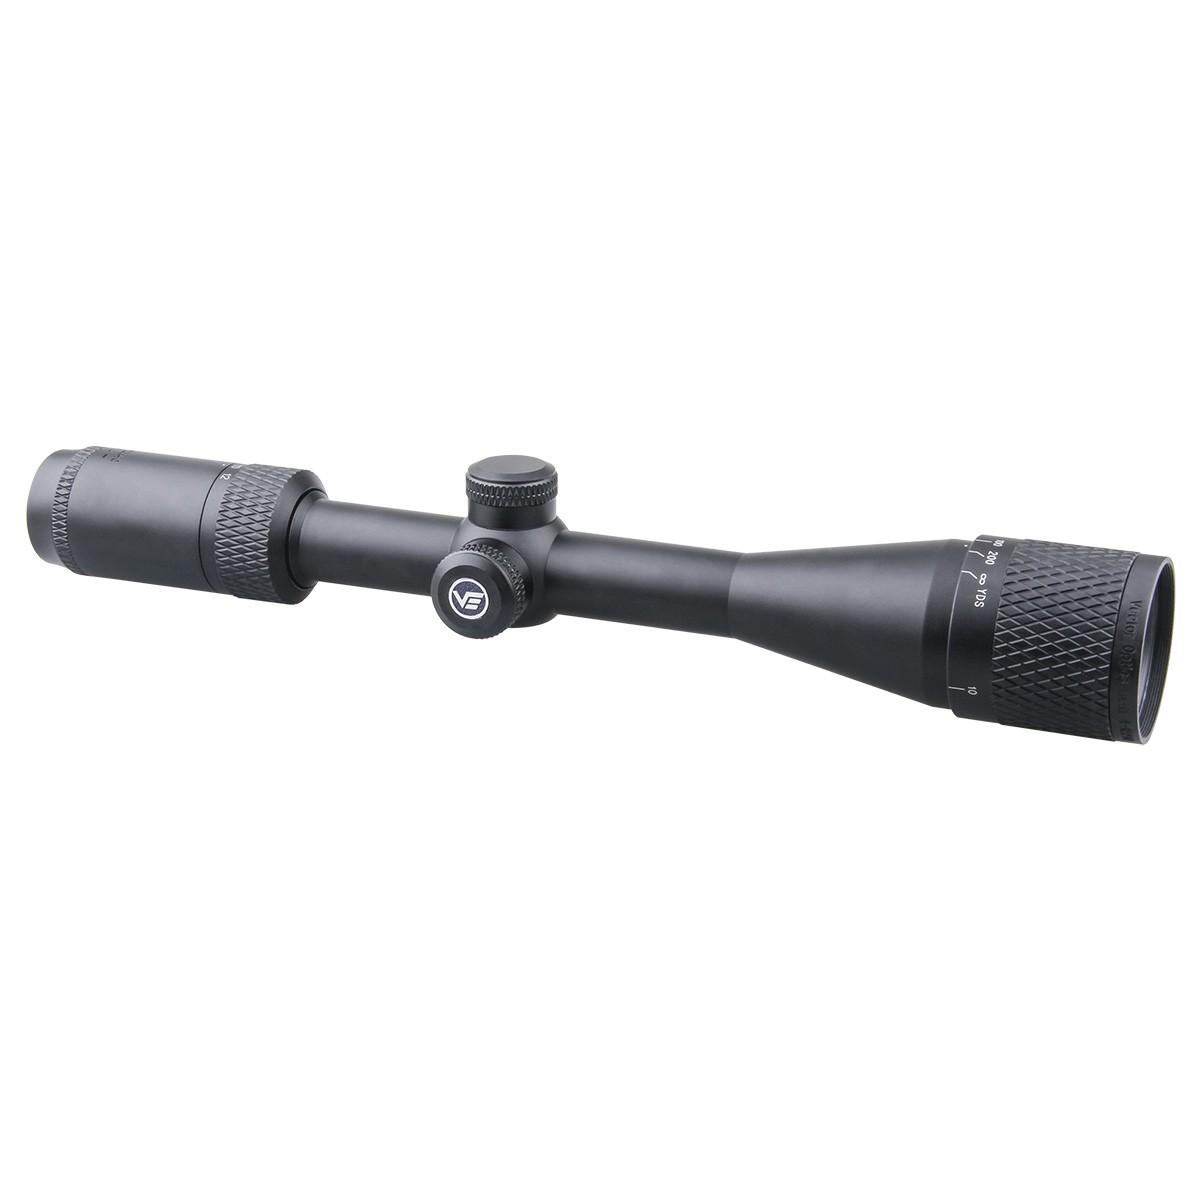 Matiz 4-12x40SFP Riflescope